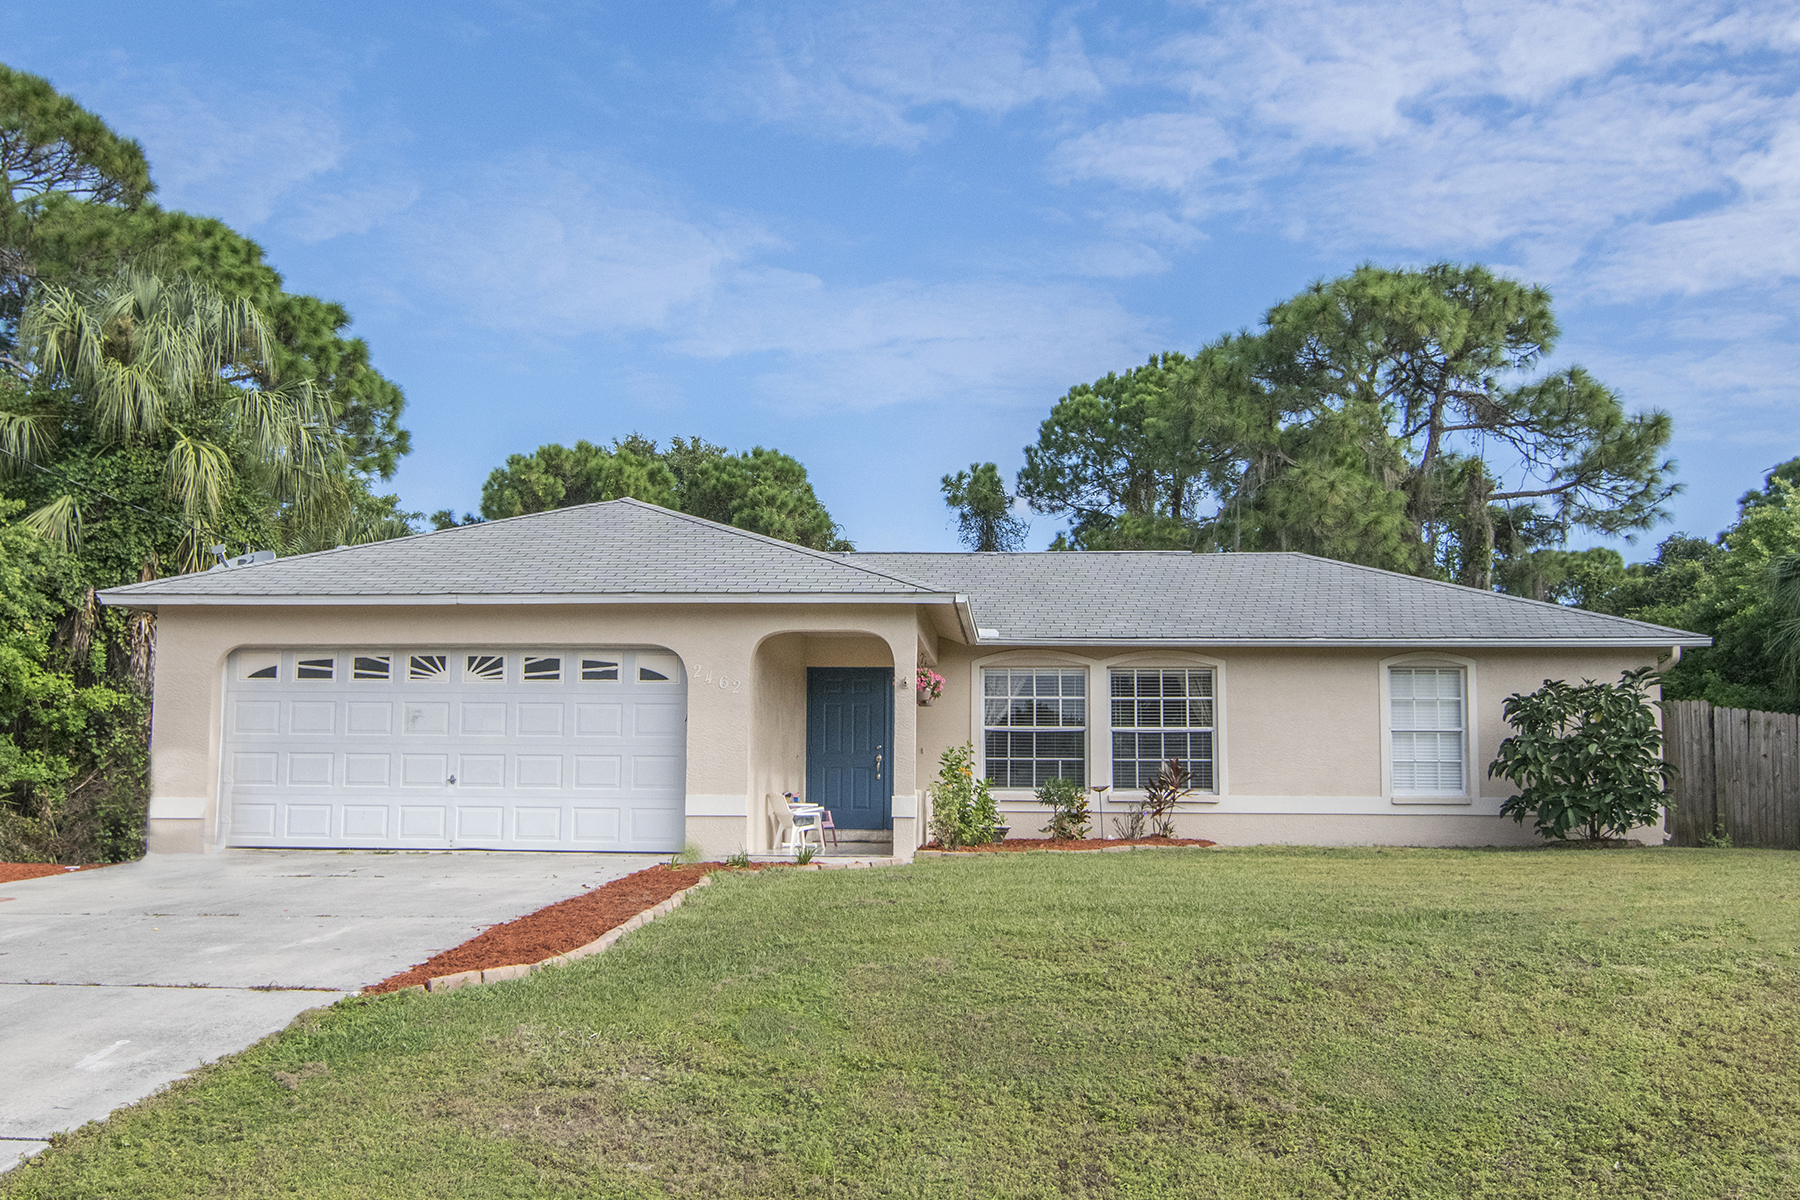 Single Family Home for Sale at NORTH PORT 2462 Ensenada Ln North Port, Florida, 34286 United States